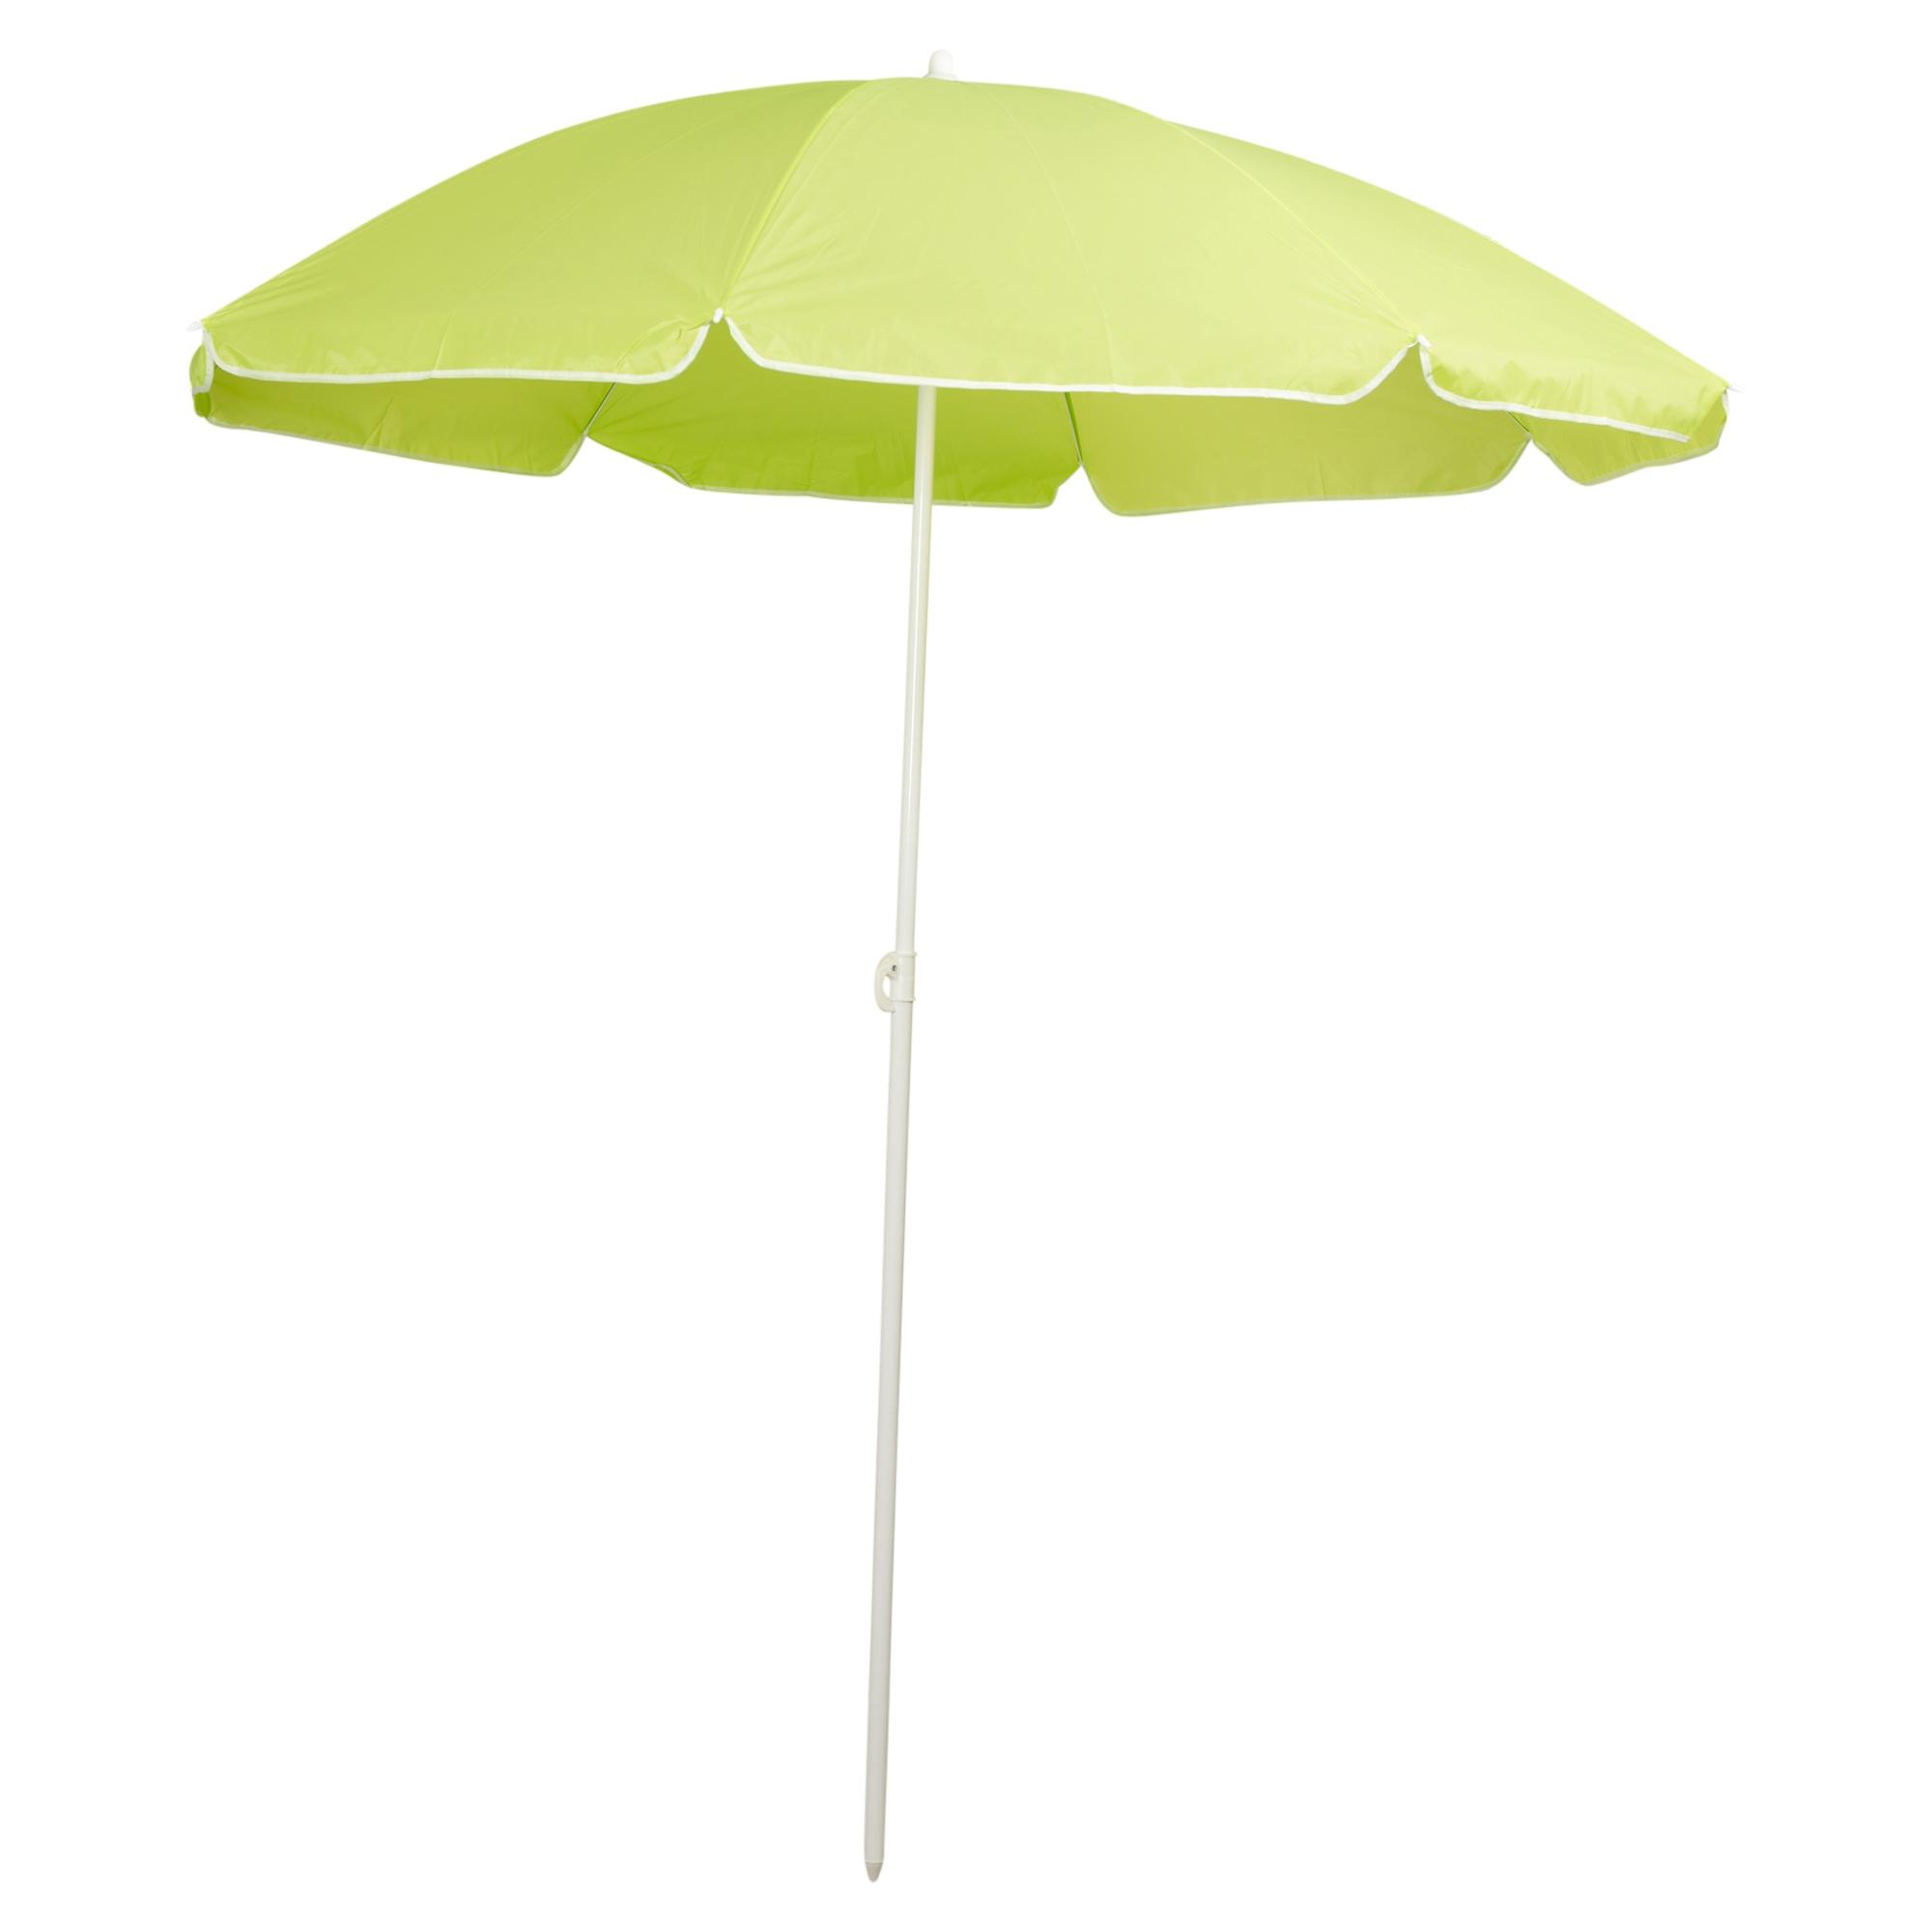 Uv Patio Umbrella: Garden Beach Deck Chair Parasol Umbrella Sunshade Spike